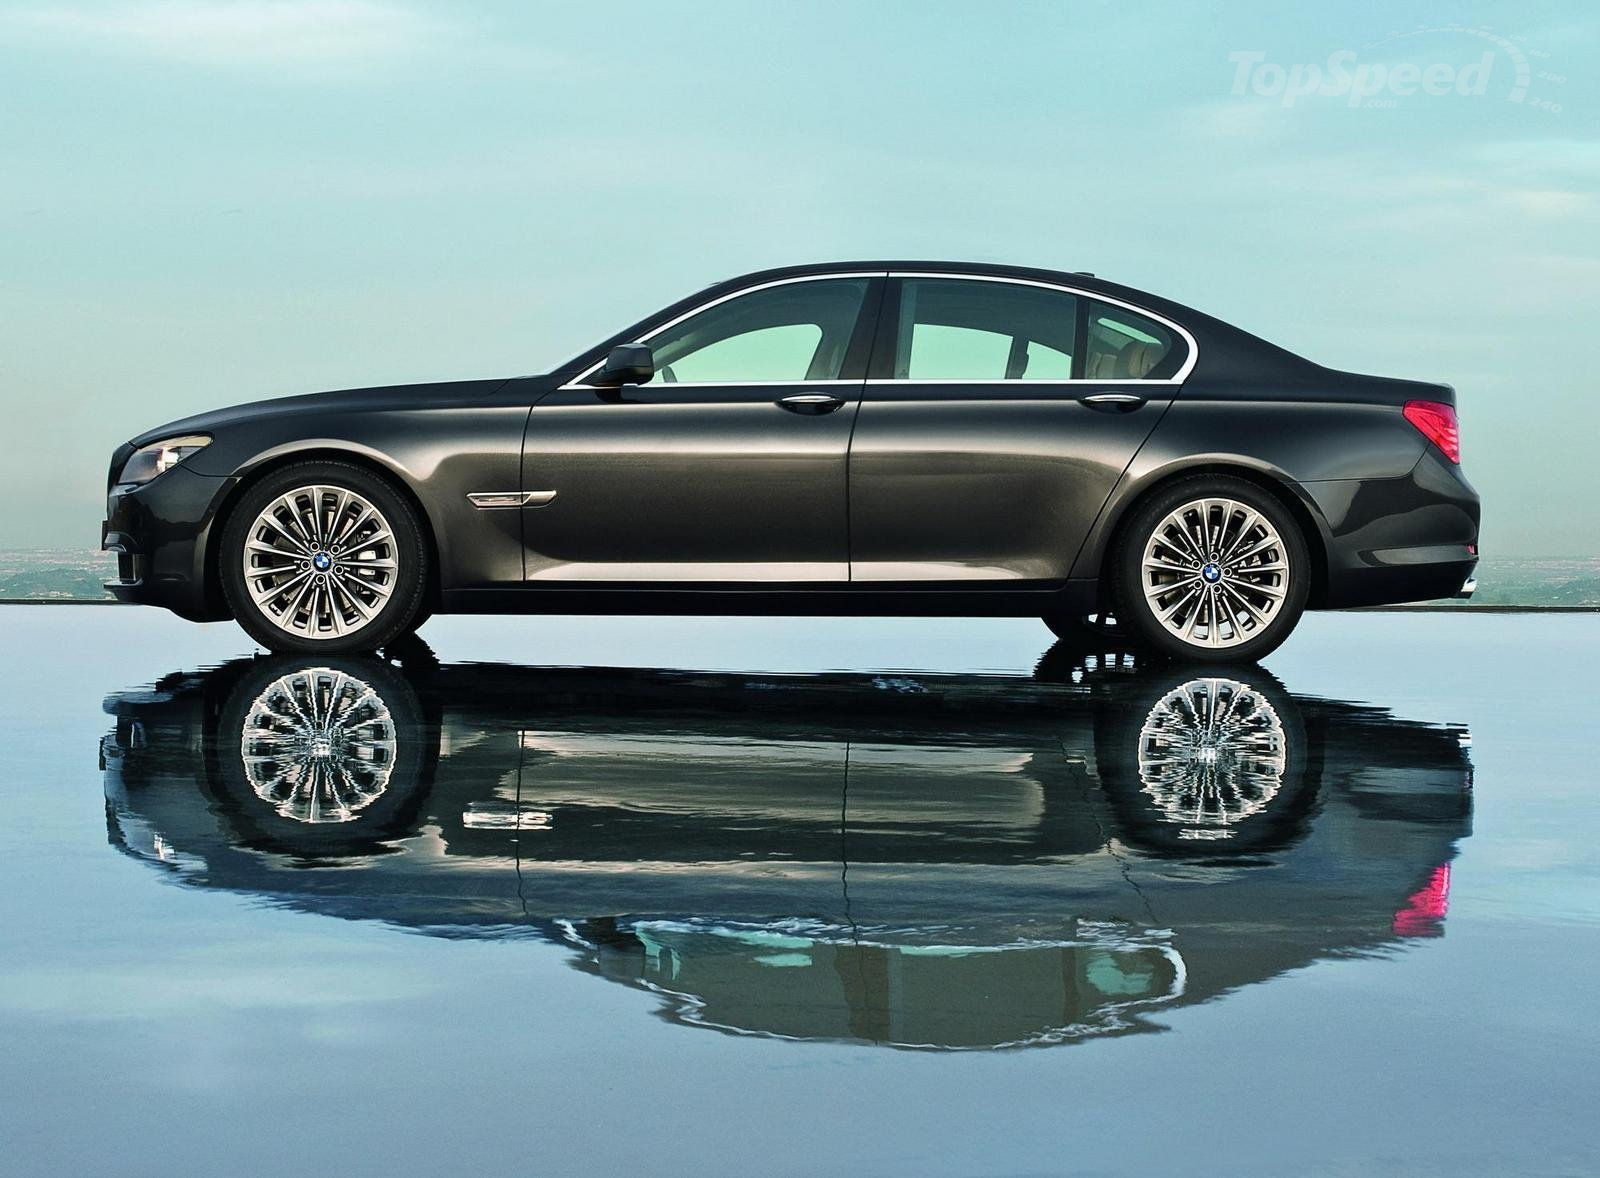 http://4.bp.blogspot.com/-dkbVdsGEwGg/UEnrkmwZyKI/AAAAAAAABj8/4ucZB6vfFBs/s1600/BMW-740d-wallpapers+(5).jpg